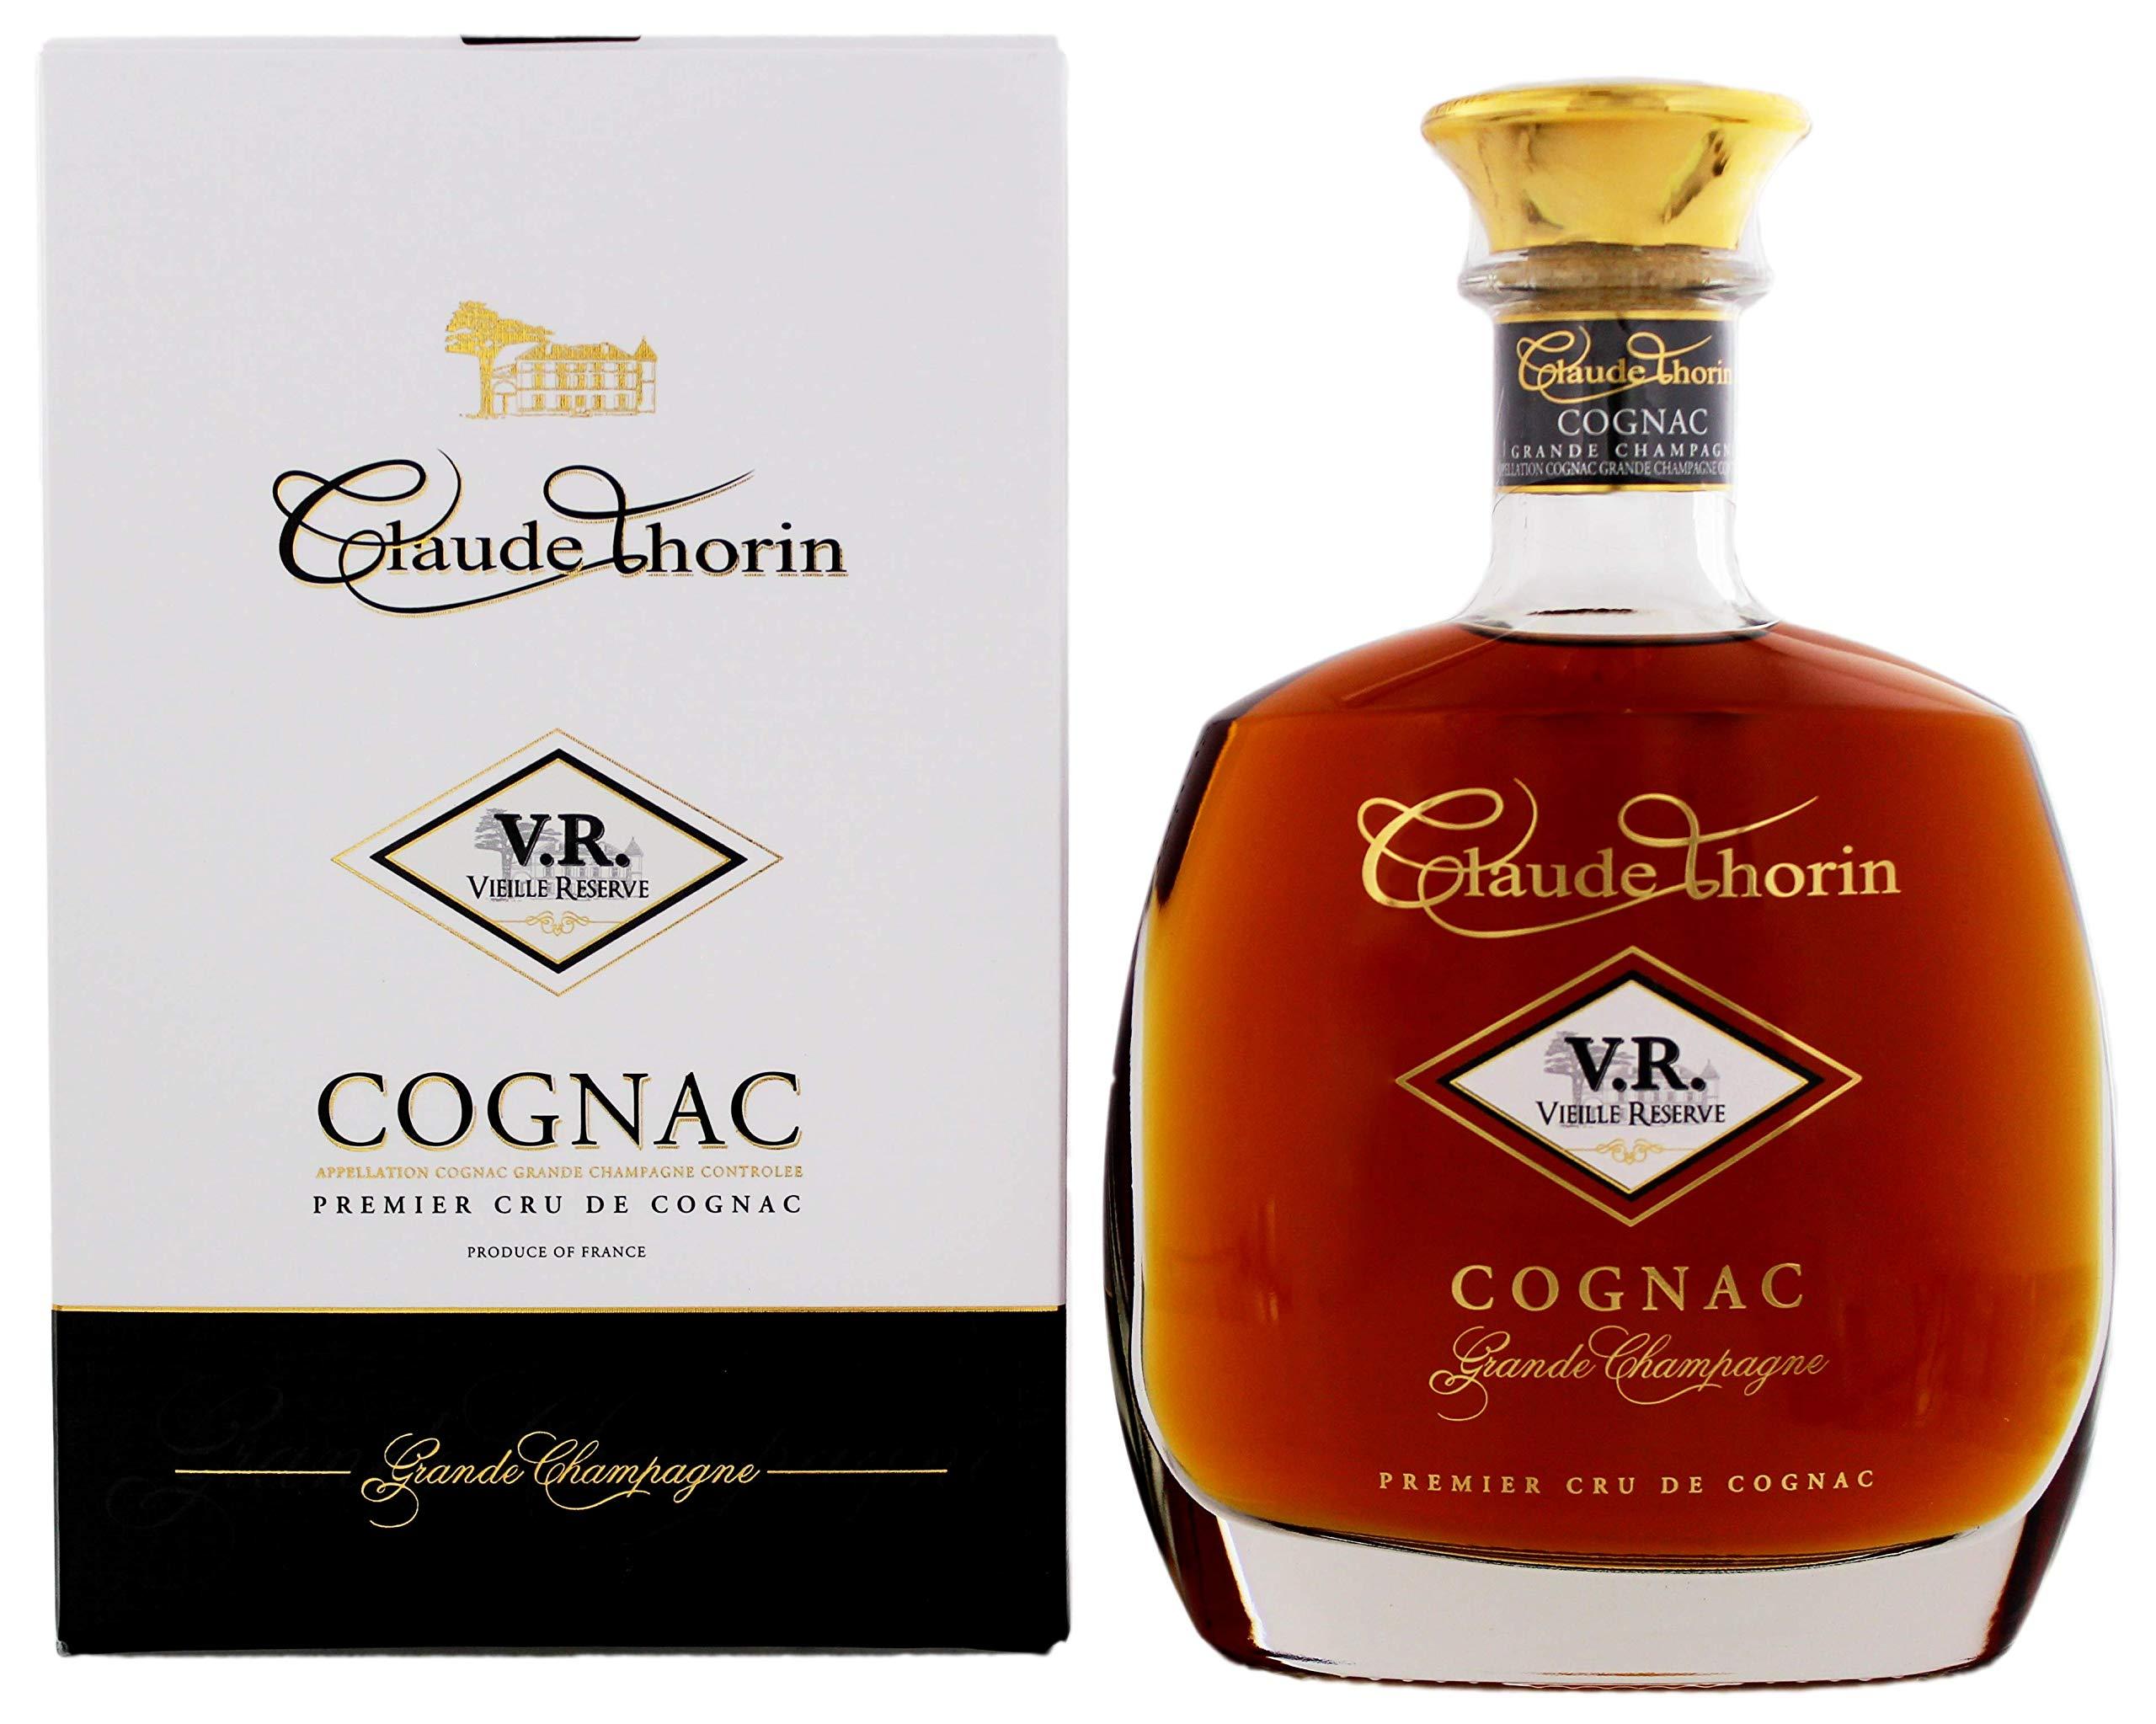 Claude-Thorin-Cognac-Grande-Champagne-VR-Vieille-Rserve-GB-Cognac-1-x-07-l